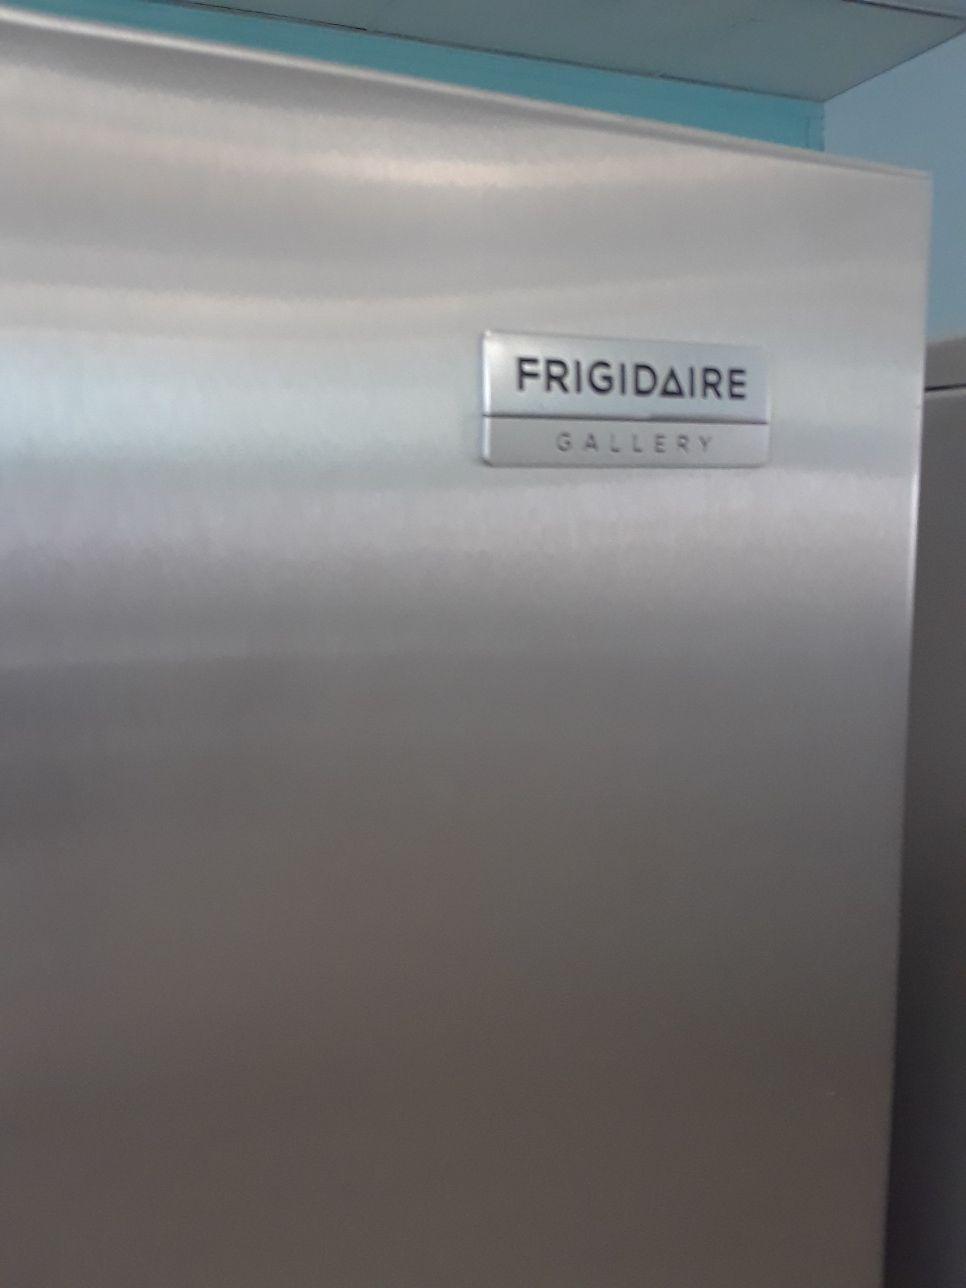 NEW FRIGIDAIRE GALLERY STAINLESS STEEL REFRIGERATOR